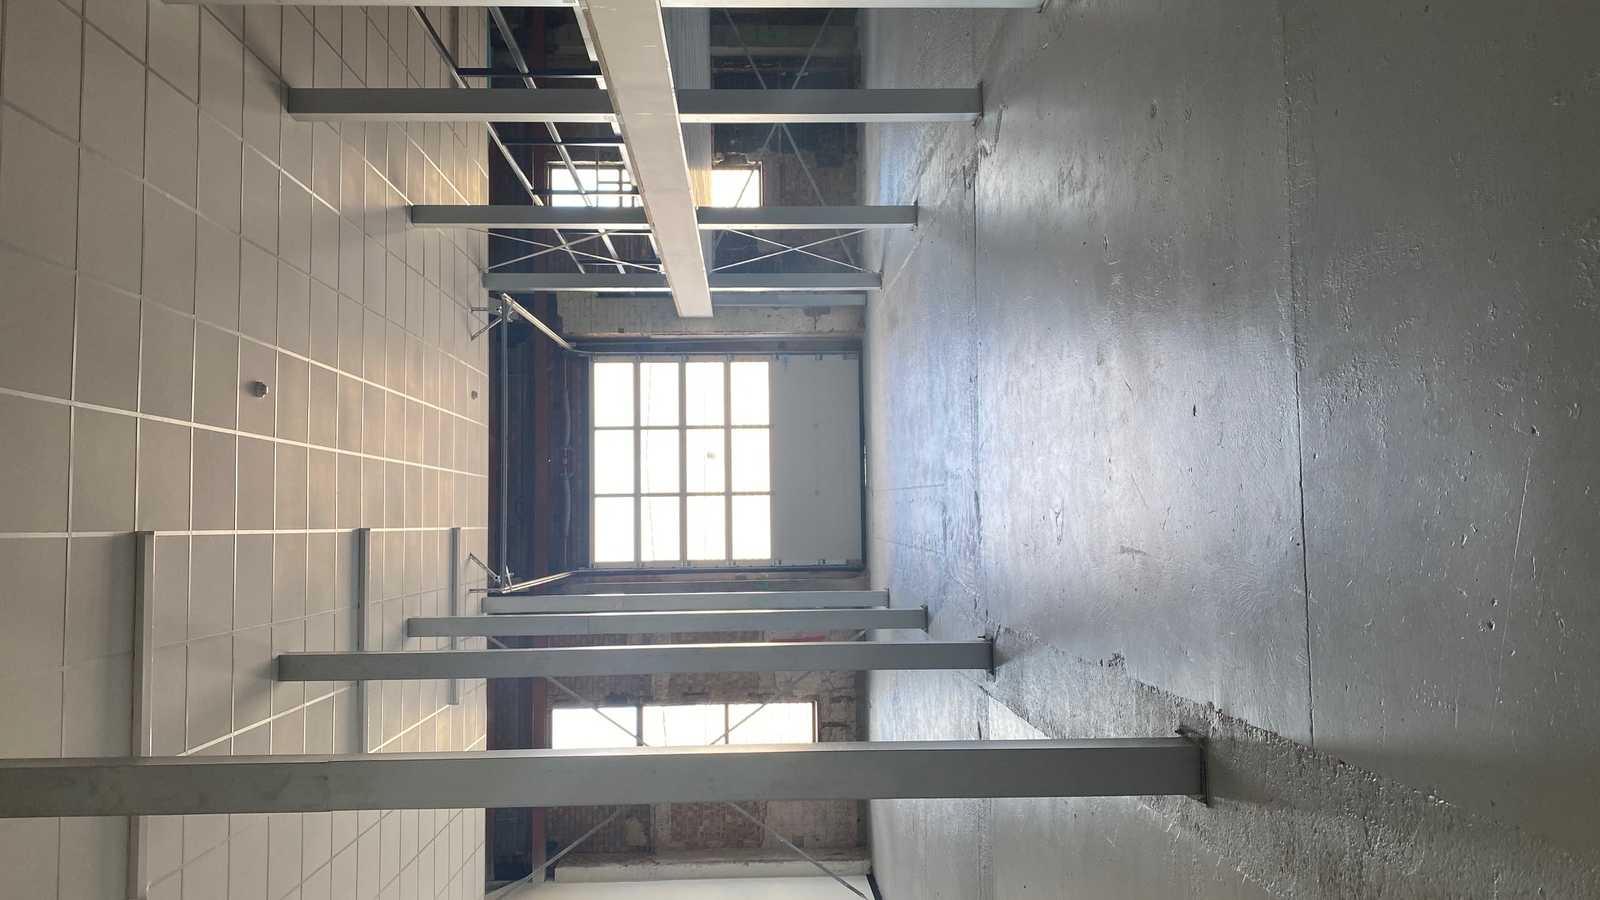 Creative Space - Studio 101/103 - Oxgate House - Brent Cross